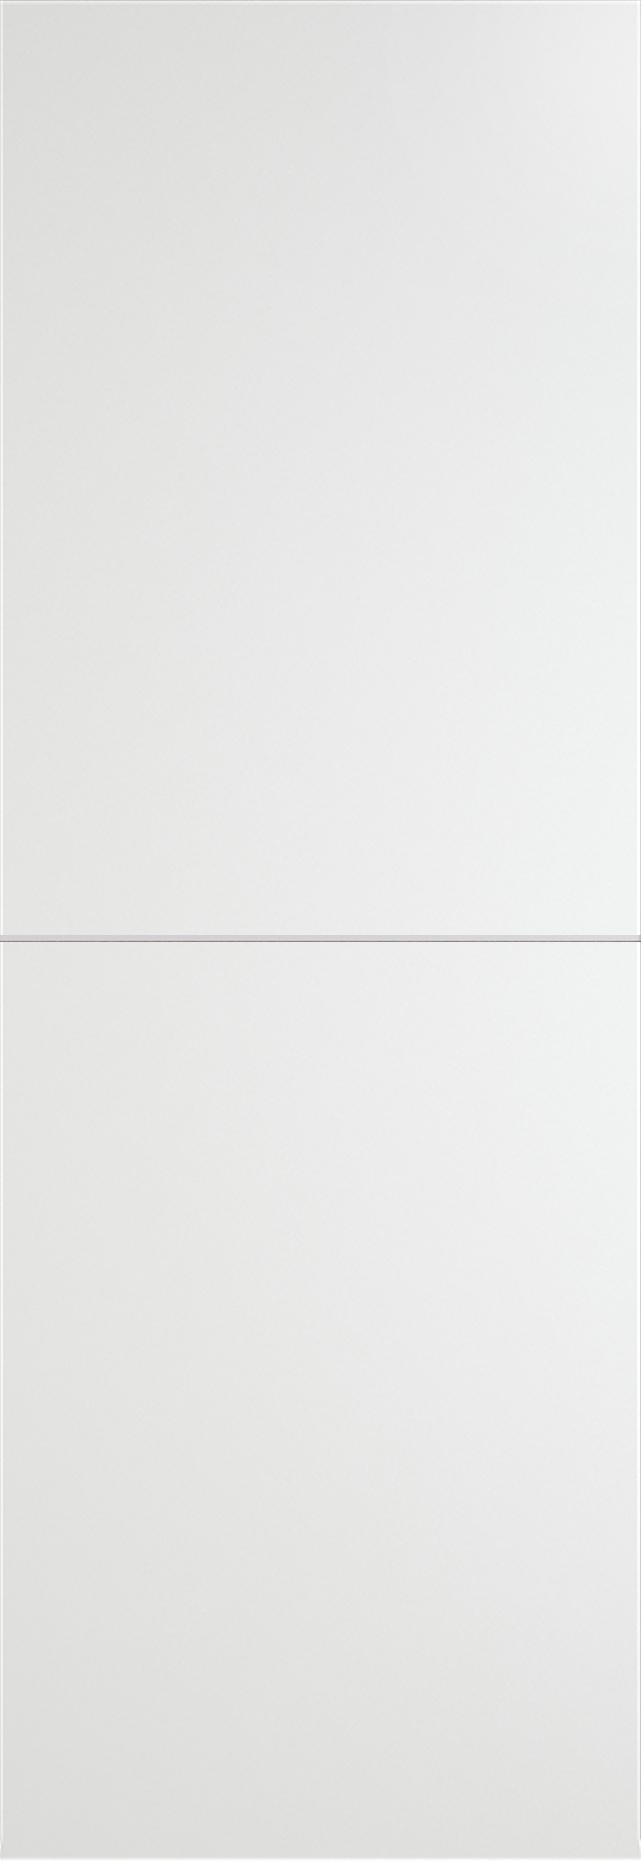 Tivoli Б-3 Invisible цвет - Белая эмаль Без стекла (ДГ)